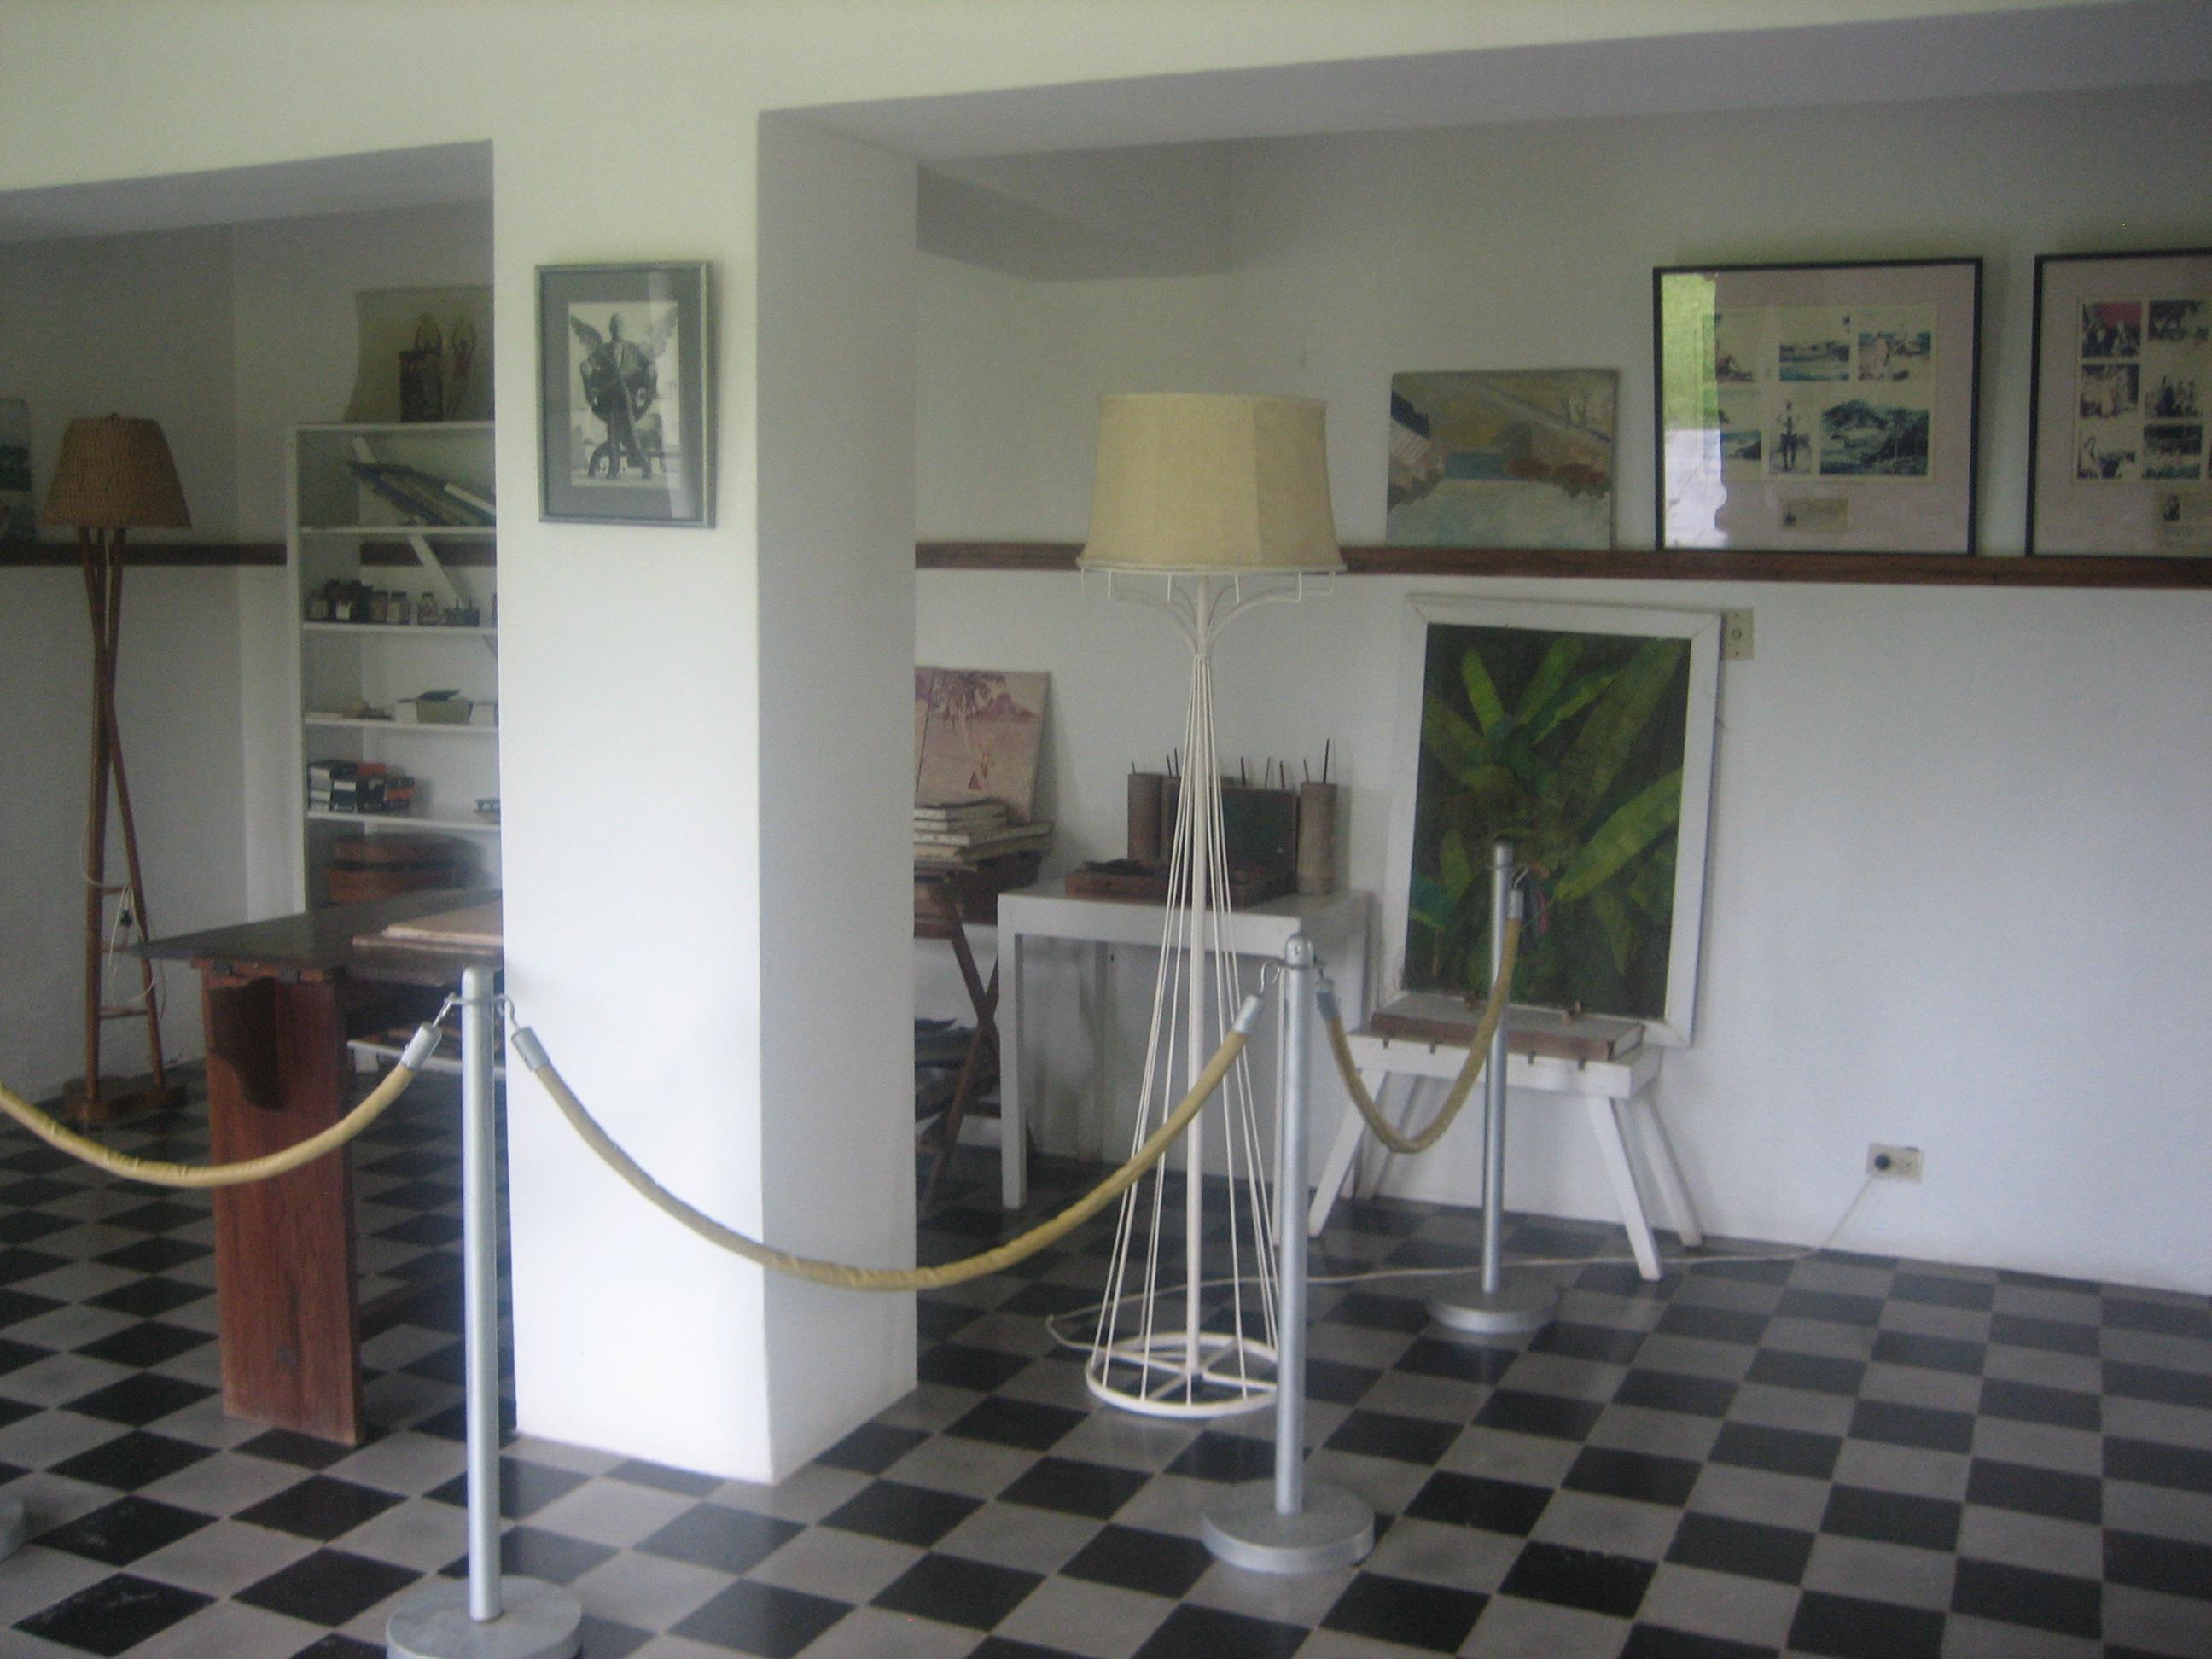 Firefly, Former Home of Sir Noel Coward - Ochos Rios, Jamaica